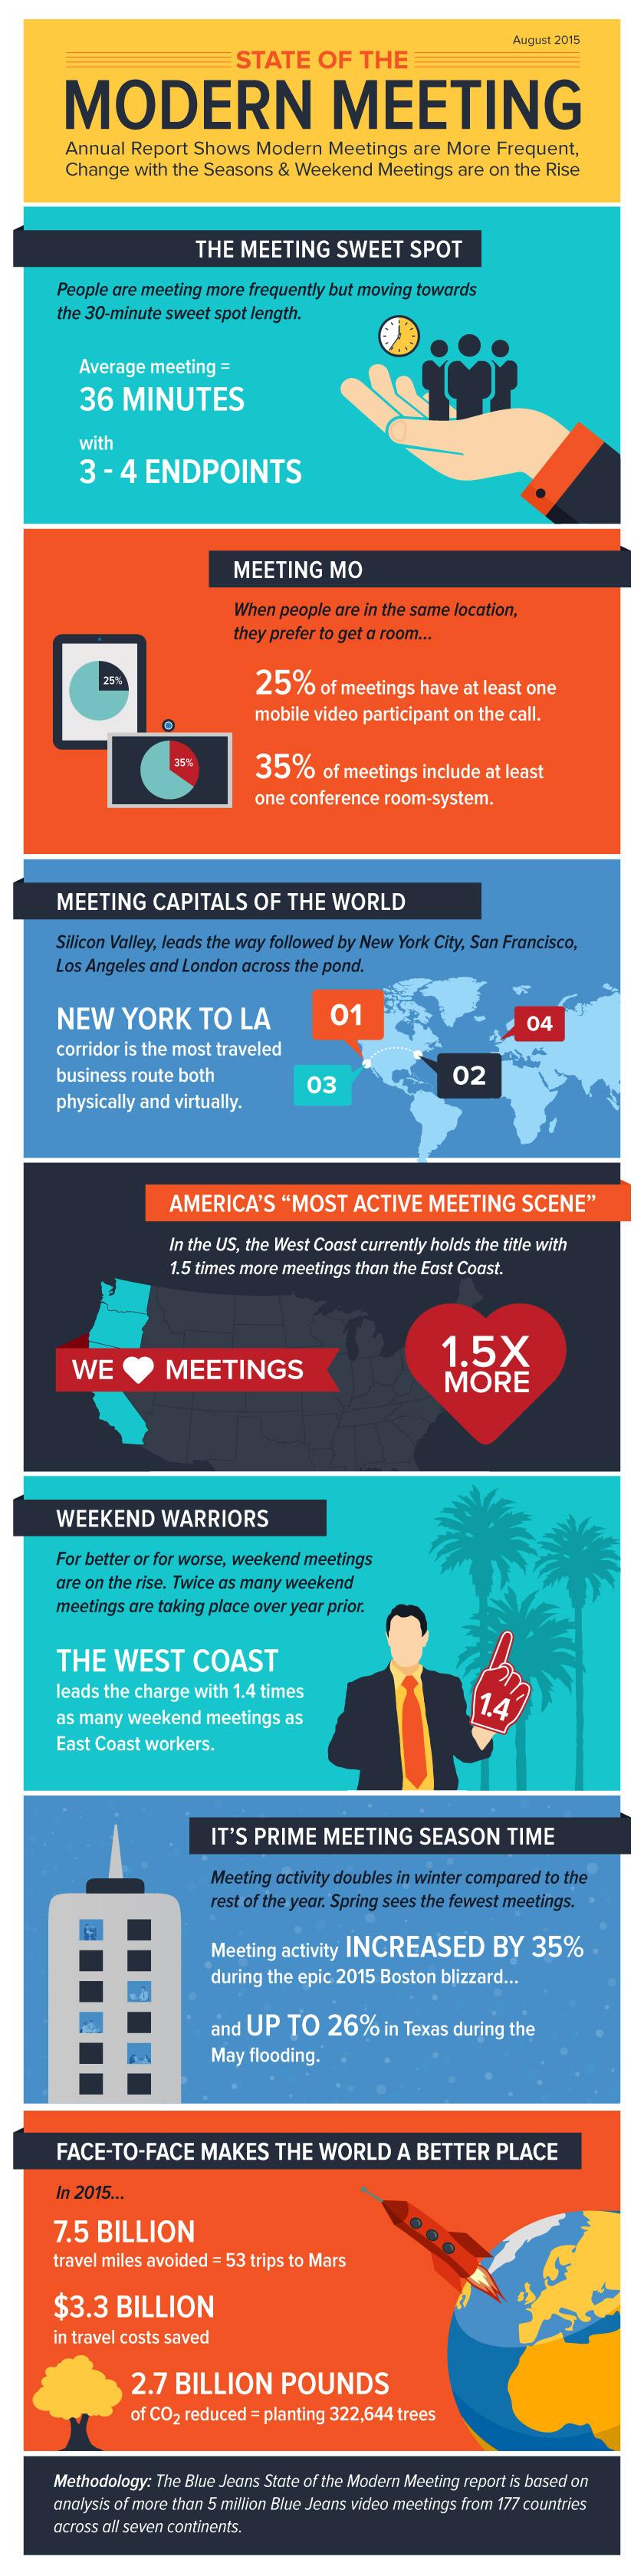 state-of-the-modern-meeting-2015.jpg